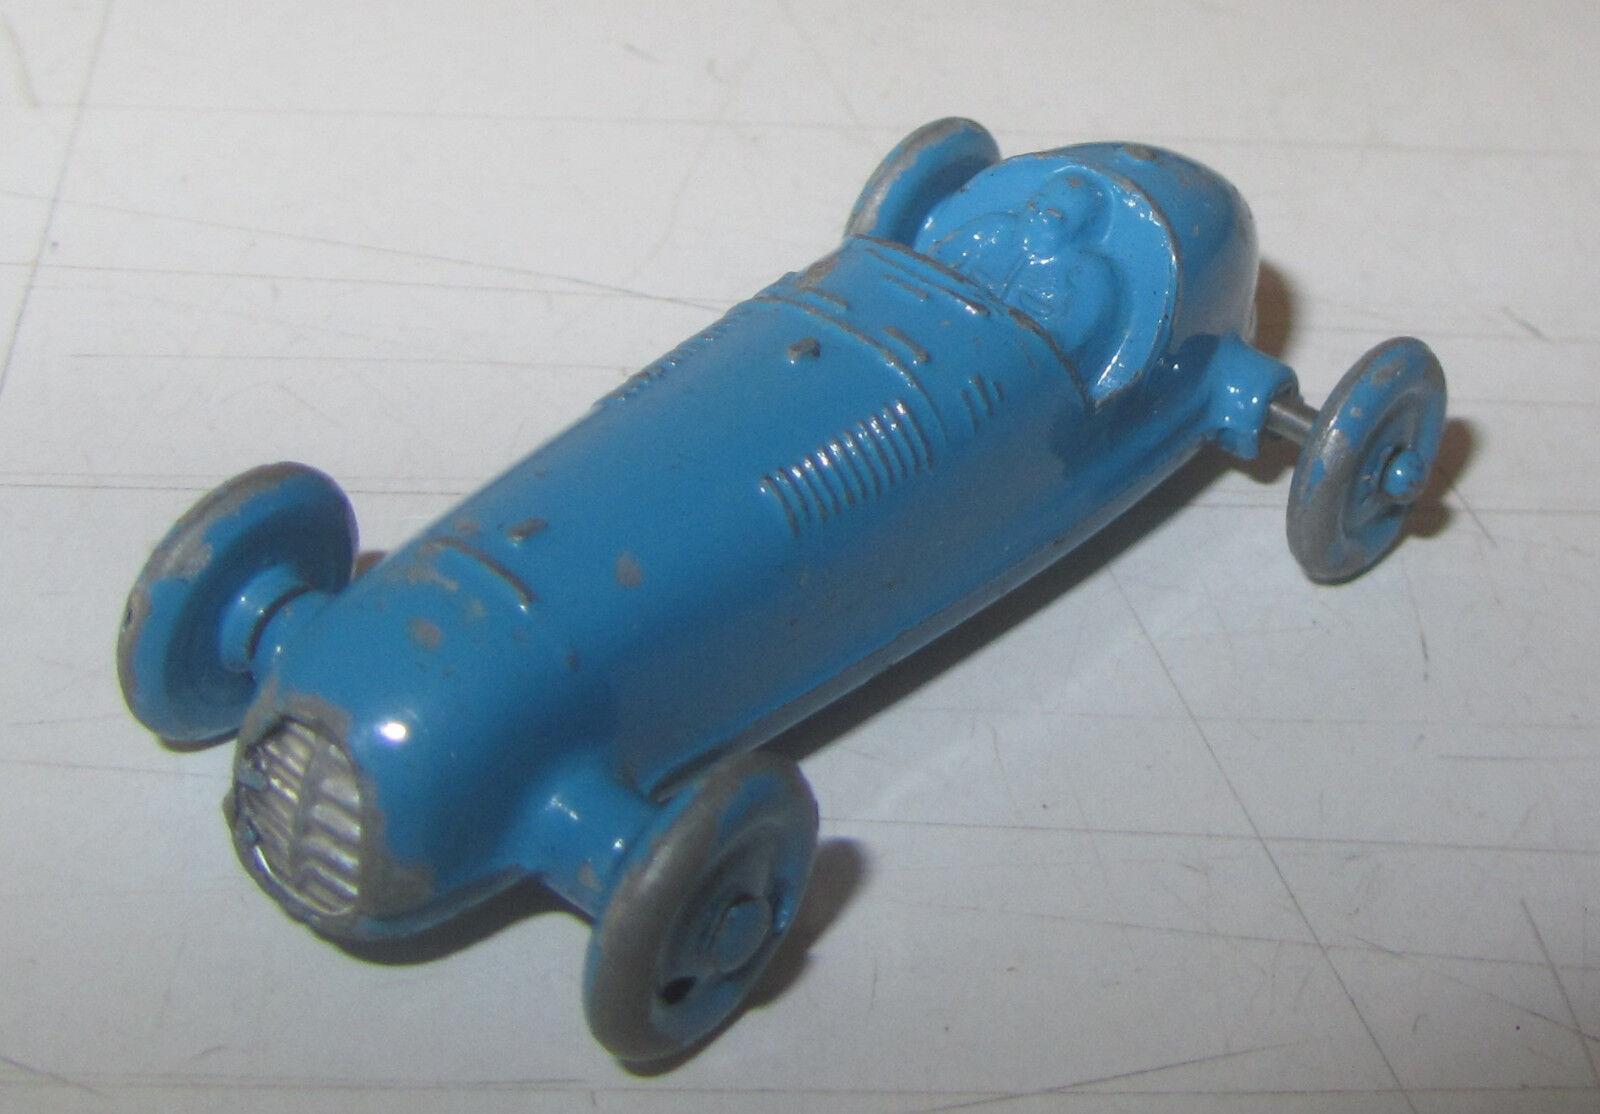 Modelino Mercury 44 4 Microcorsa CisItalia 1100 Spese Gratis